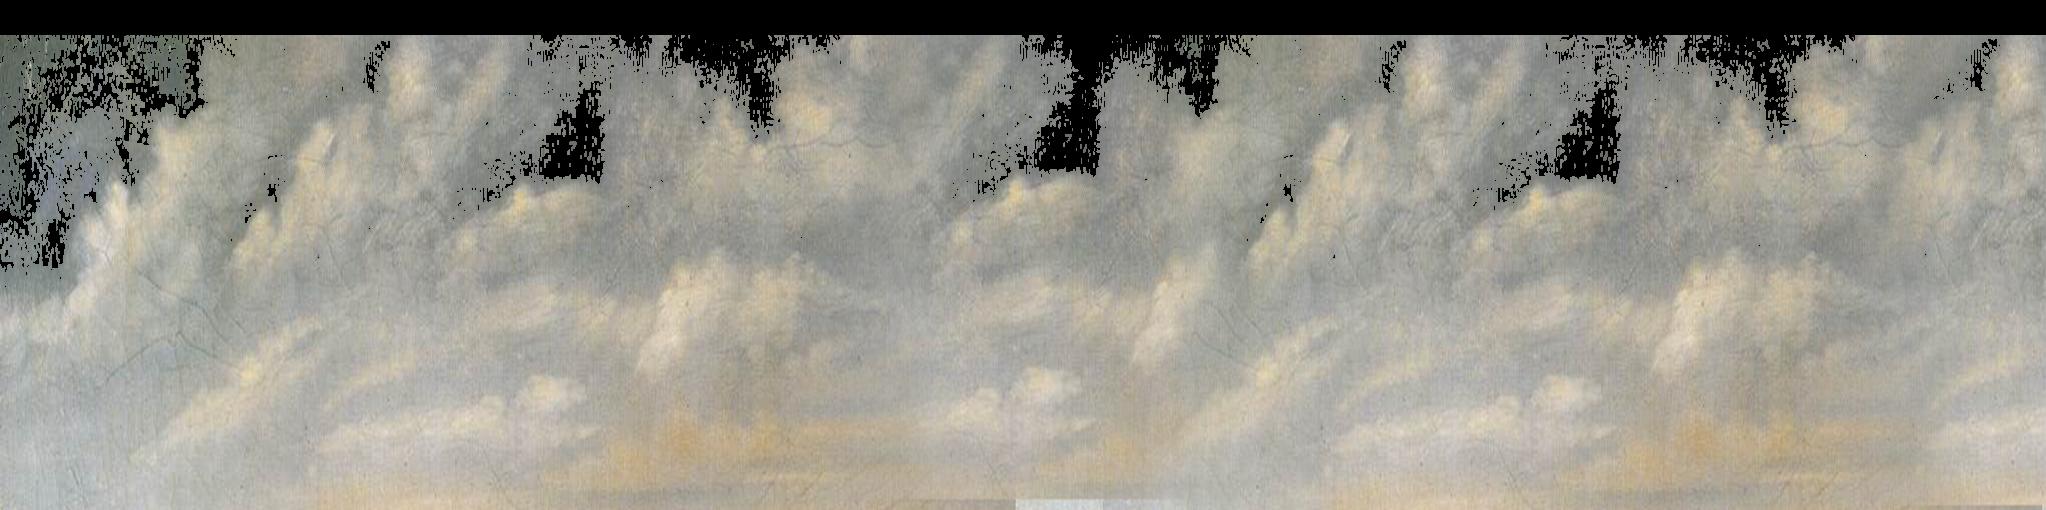 Png transparent images all. Fog clipart mist